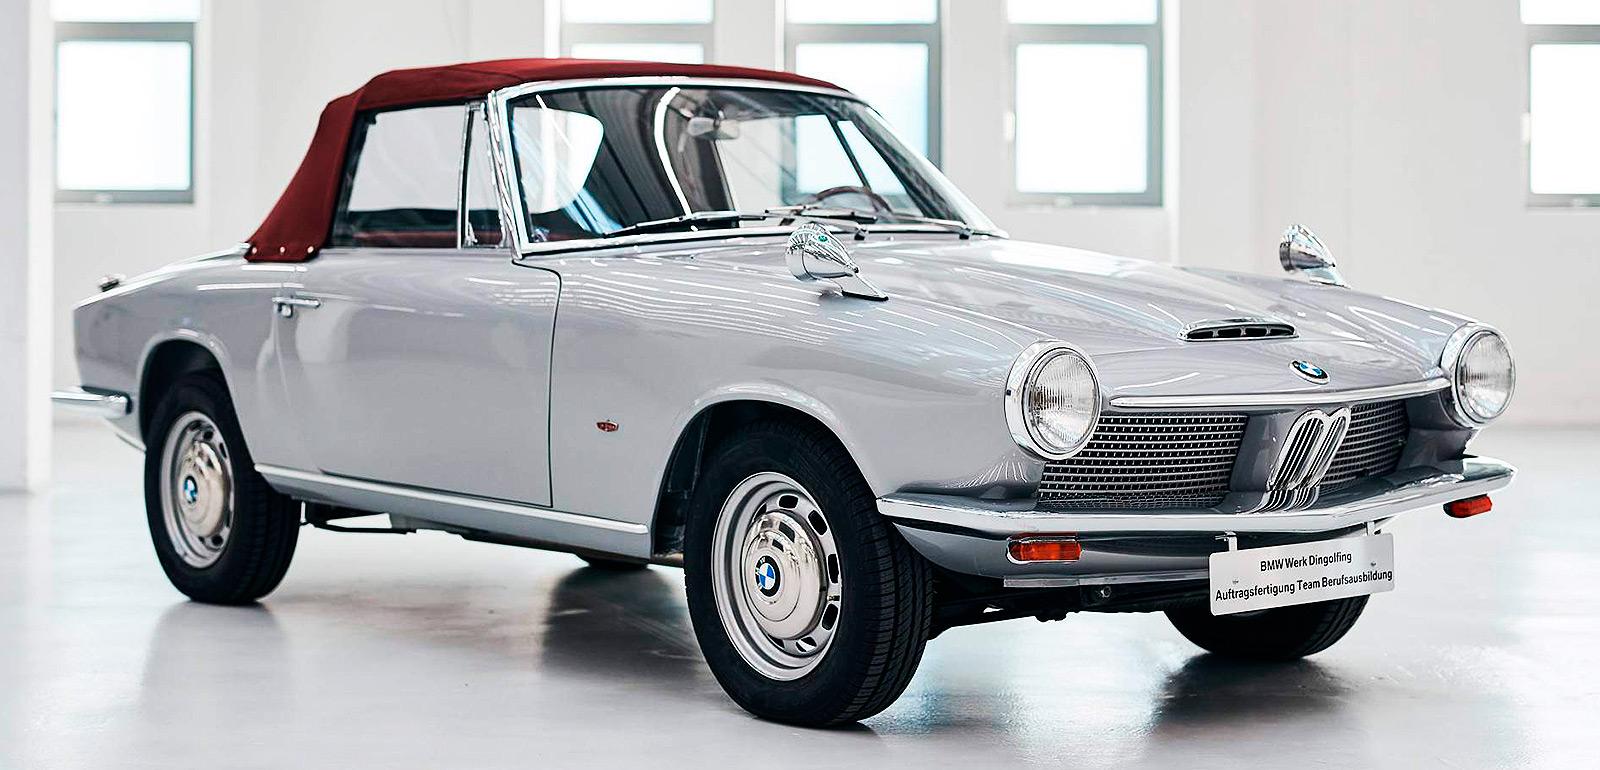 1967 bmw 1600 gt convertible imboldn. Black Bedroom Furniture Sets. Home Design Ideas